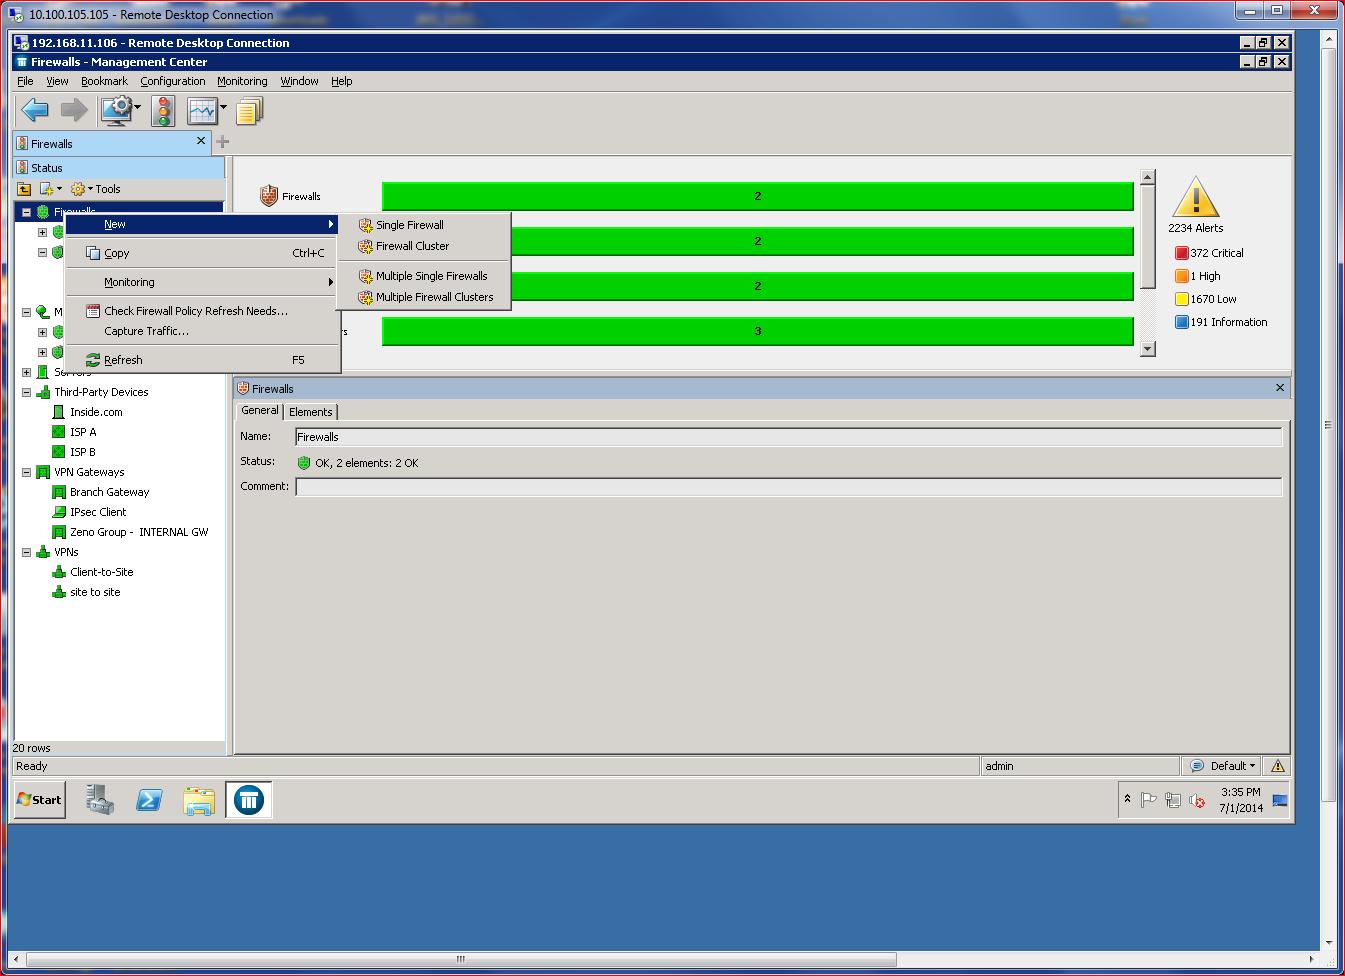 McAfee NGFW SMC - Add Firewall